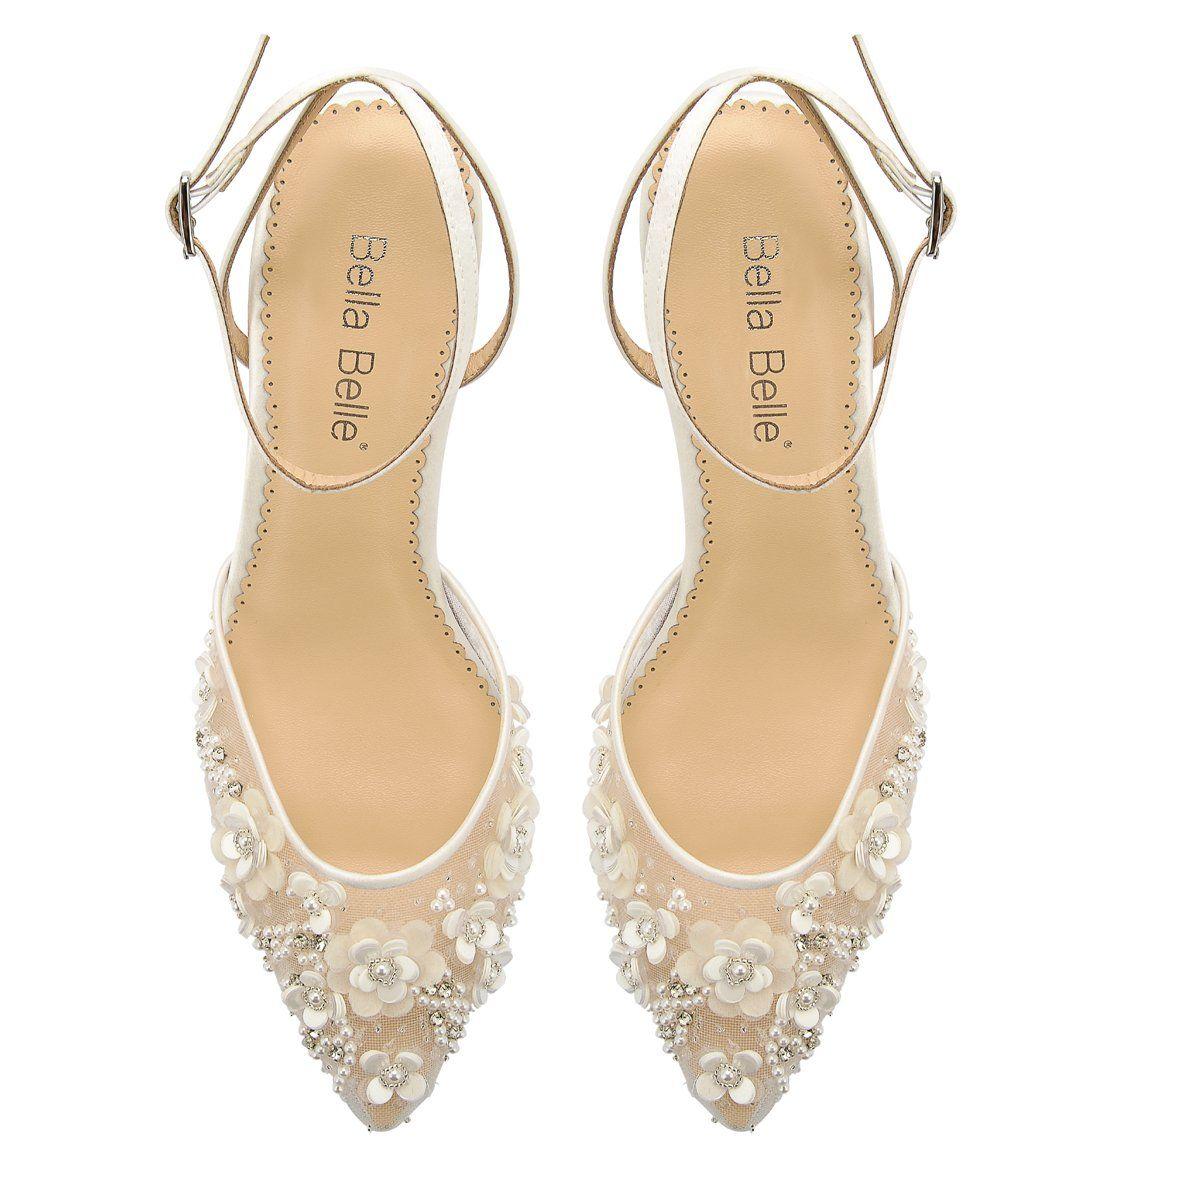 Kitten Heel Ivory Pearl Wedding Shoes In 2020 Ankle Strap Heels Pearl Wedding Shoes Blush Shoes